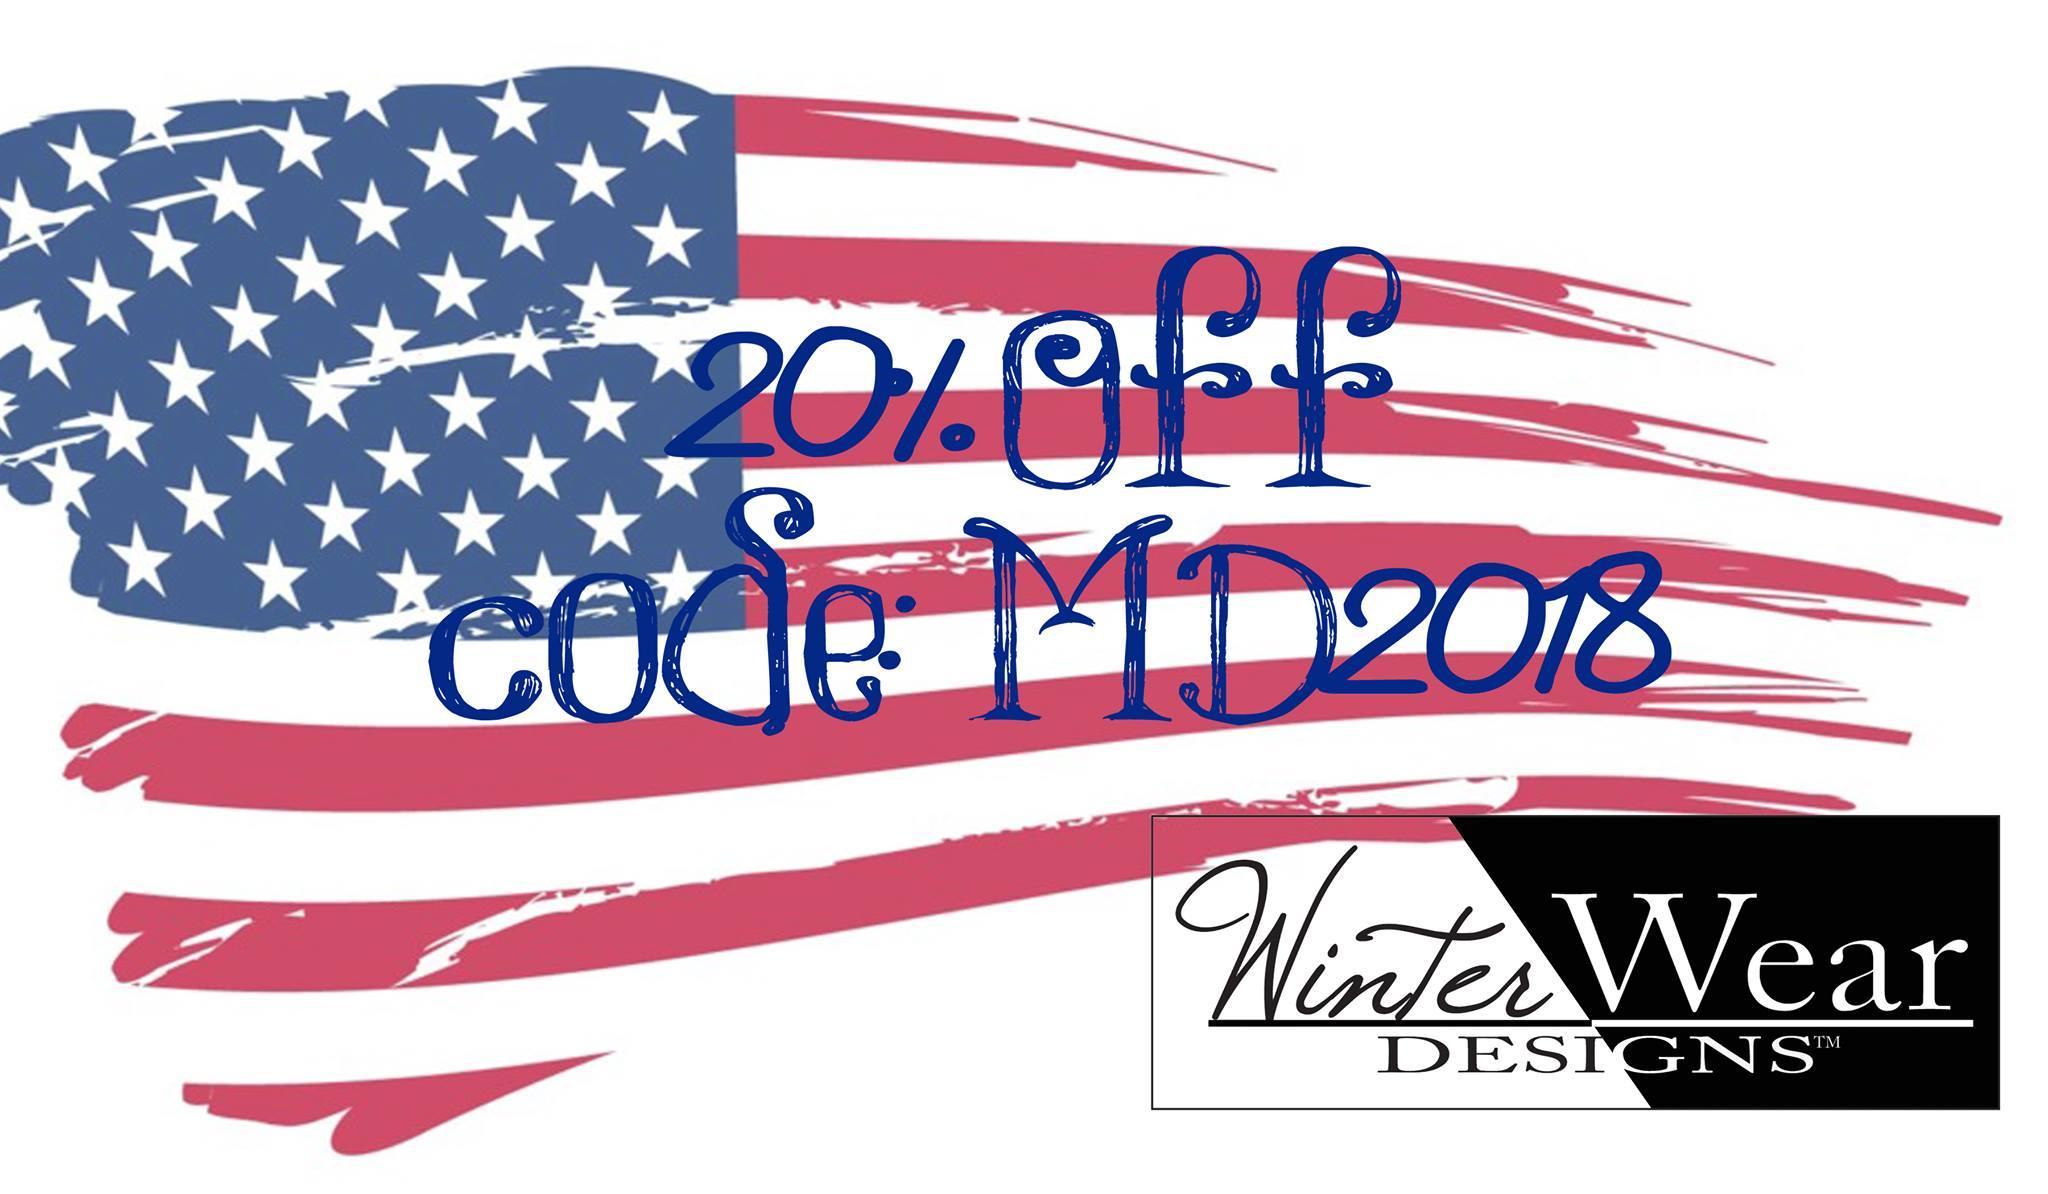 Winter Wears Designs Sewing Pattern Memorial Day Sale